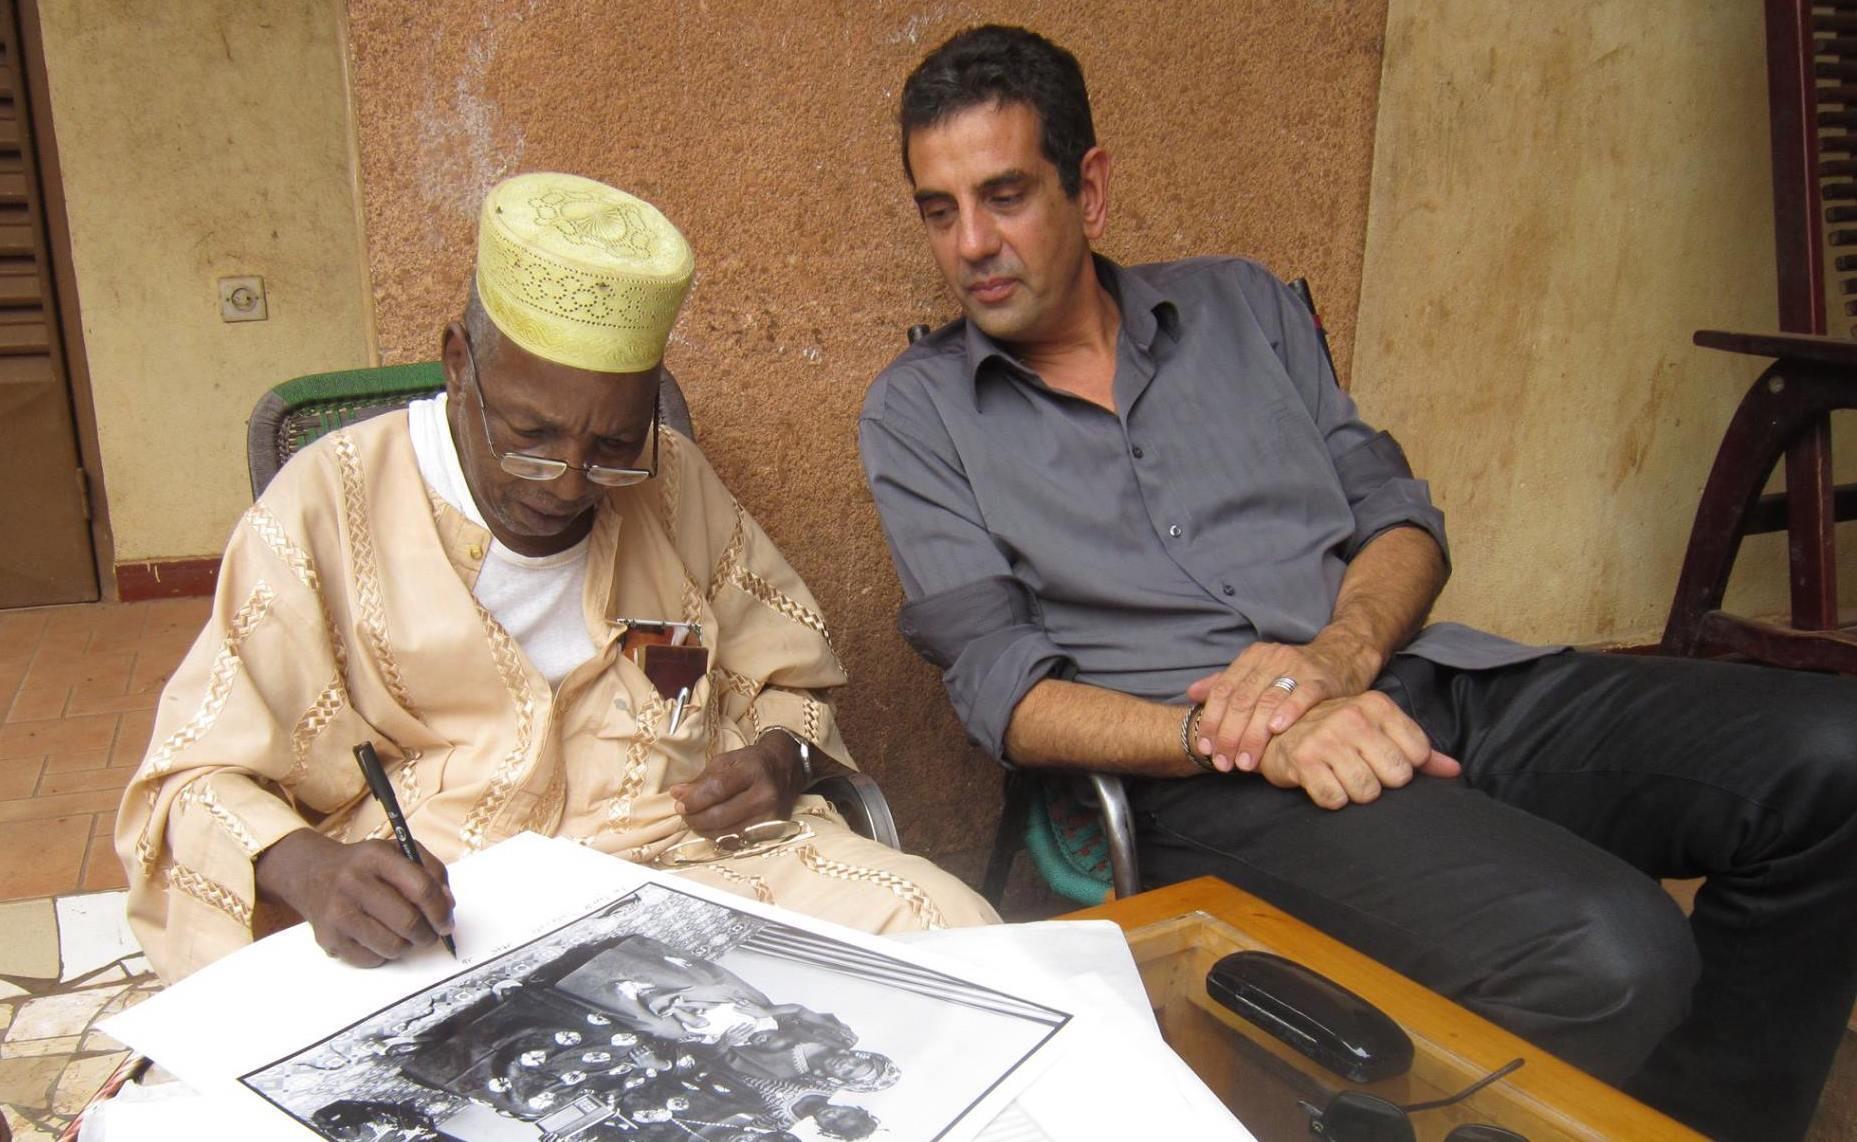 Olivier Sultan à Bamako en compagnie du grand photographe malien Malick Sidibé.